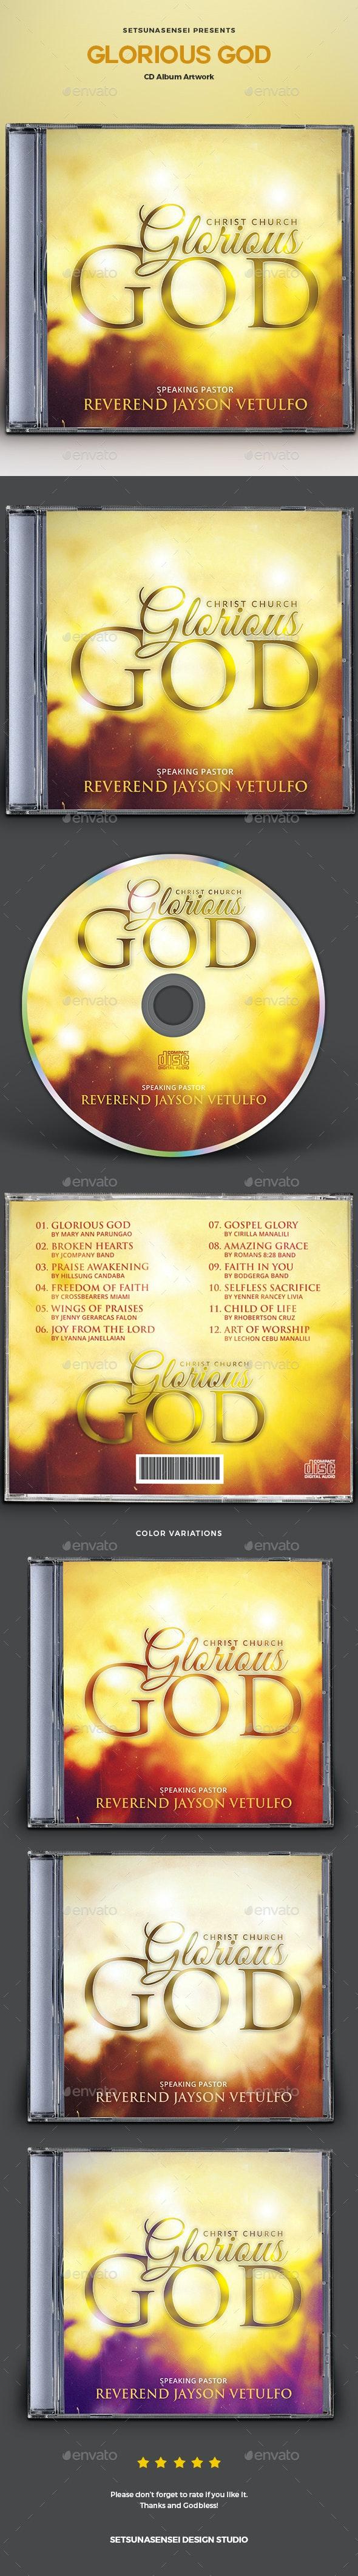 Glorious God CD Album Artwork - CD & DVD Artwork Print Templates